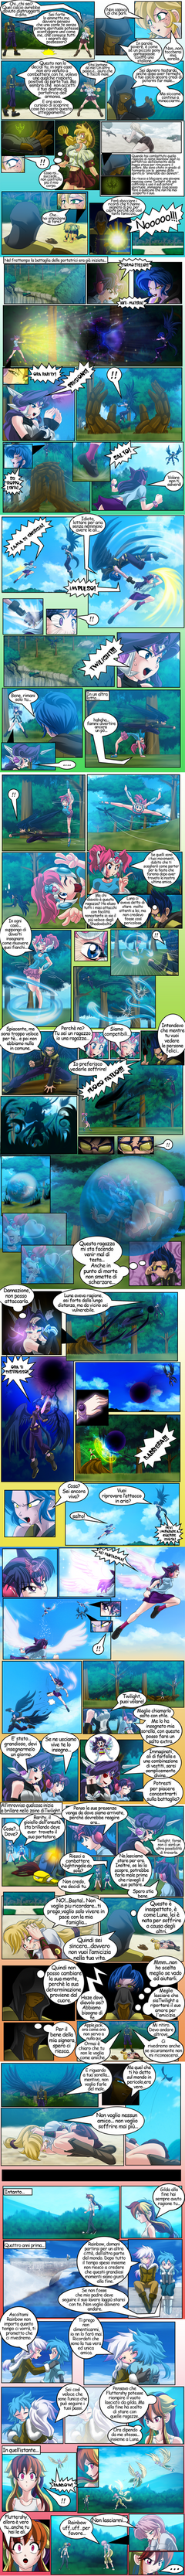 mlp human comic l'amicizia e' magica cap 4 parte 4